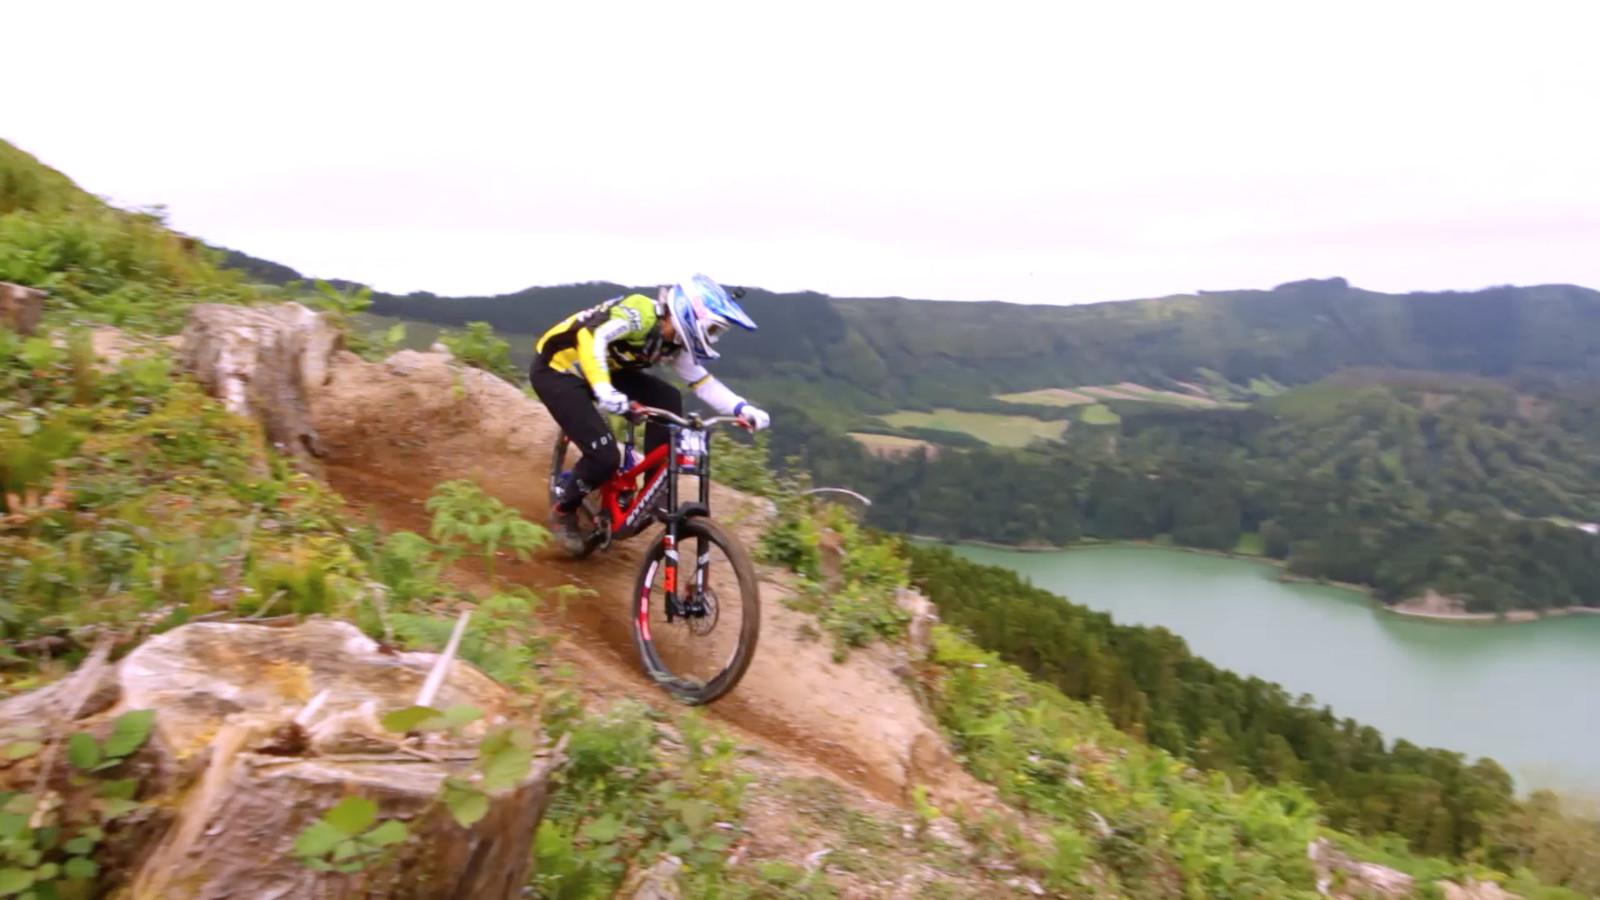 João Machado´s race weekend at Portal do Vento